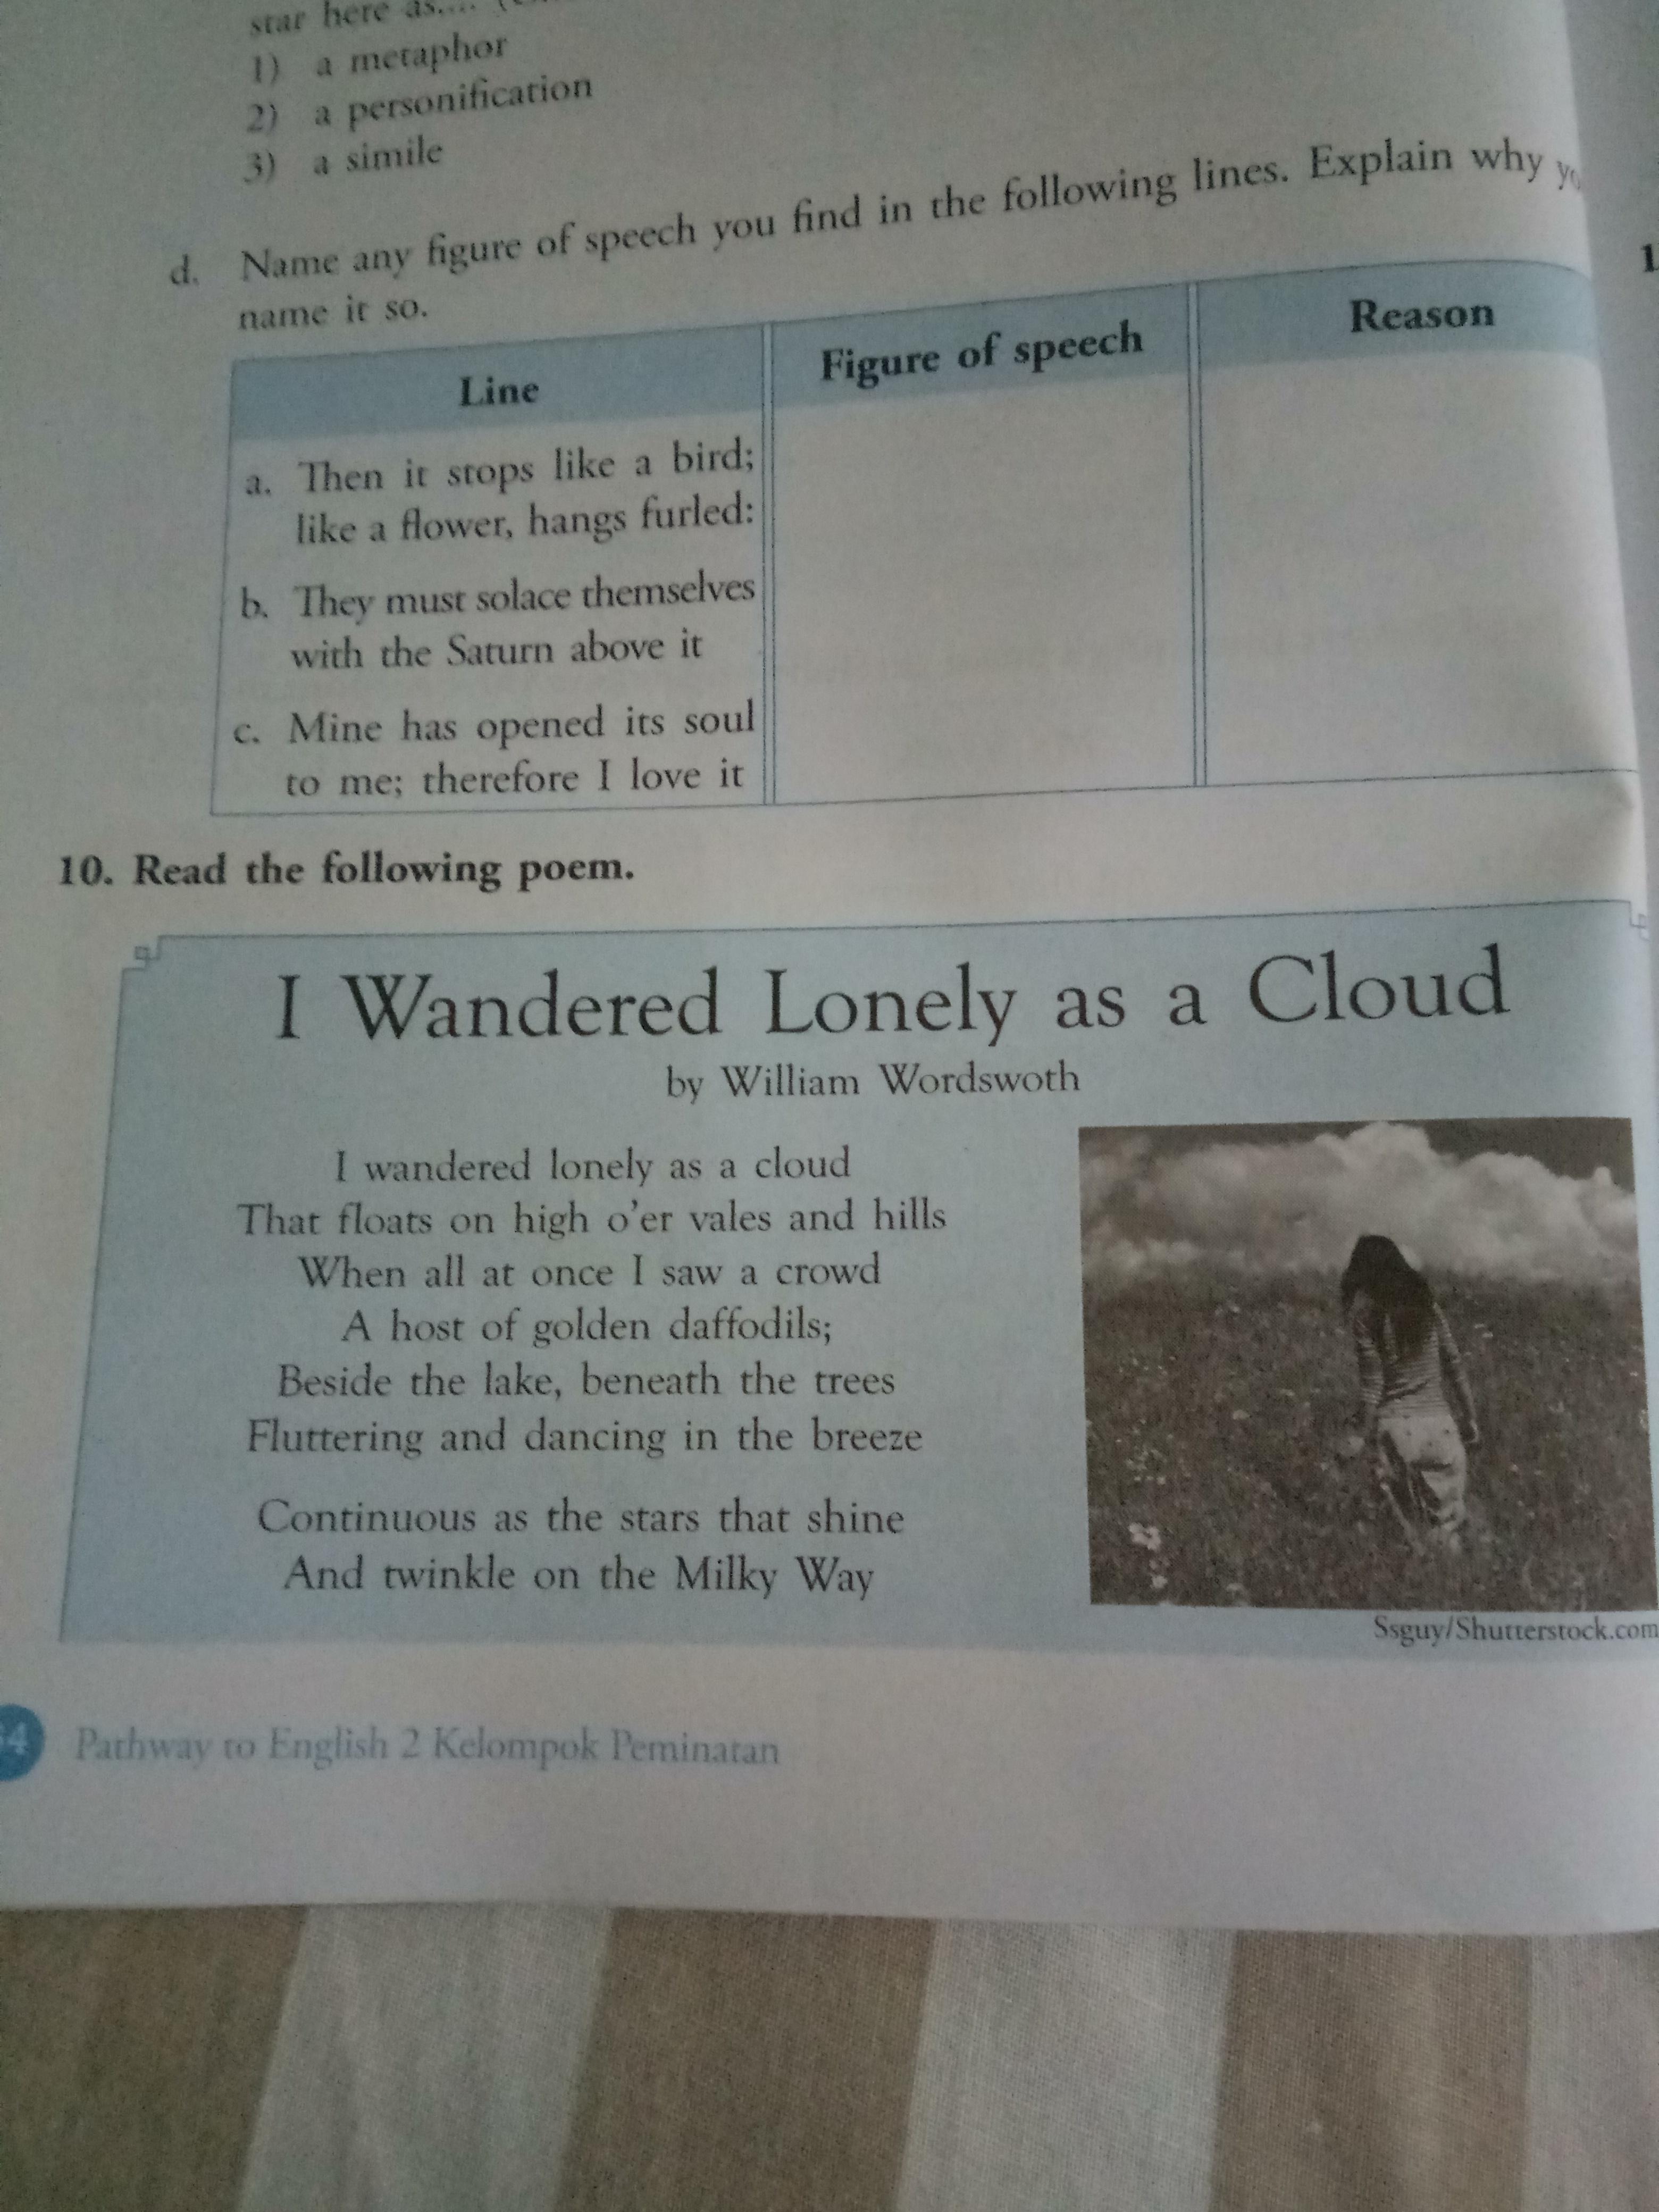 Tolong Jawab Yaa Cuman 10 Soal Kok Hari Ini Brainly Co Id What I The Main Message Of Poem Wandered Lonely A Cloud